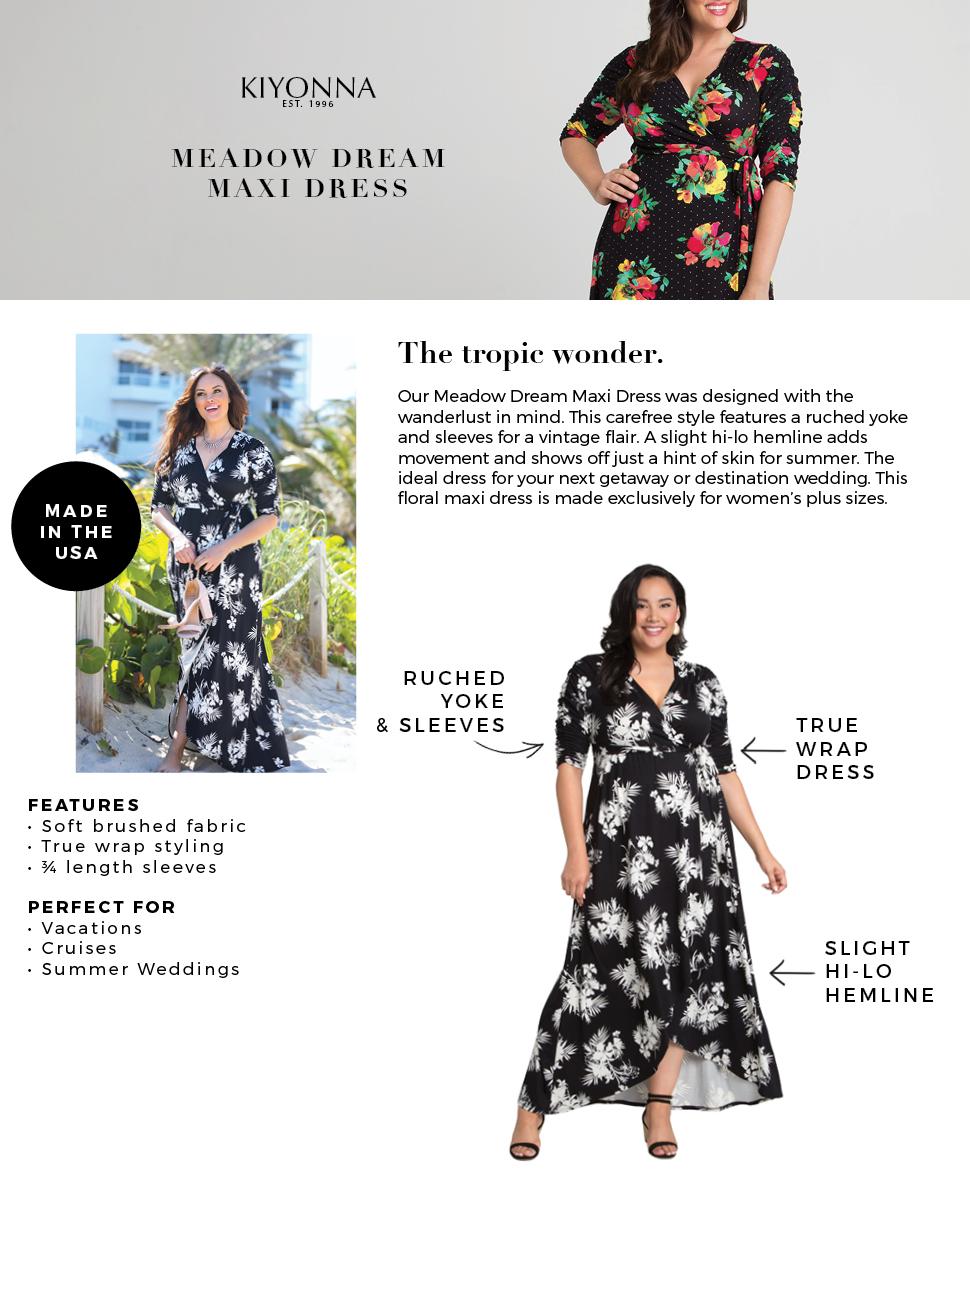 64c2bb3a348b5 Kiyonna Women s Plus Size Meadow Dream Maxi Dress at Amazon Women s ...